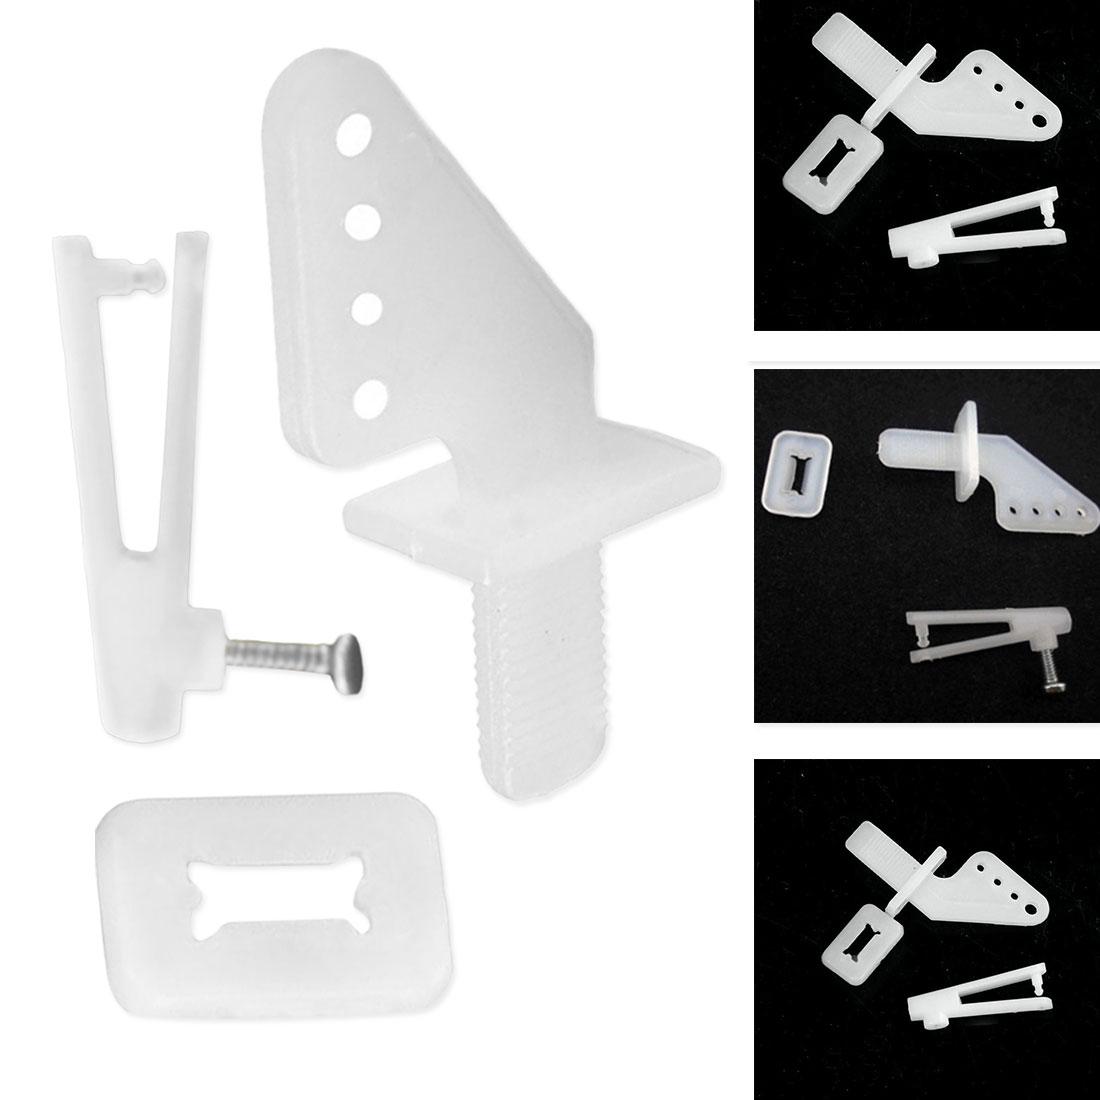 10set/lot KT rudder angle four-hole + quick adjustment rocker foam chuck Airplane Parts Aircraft